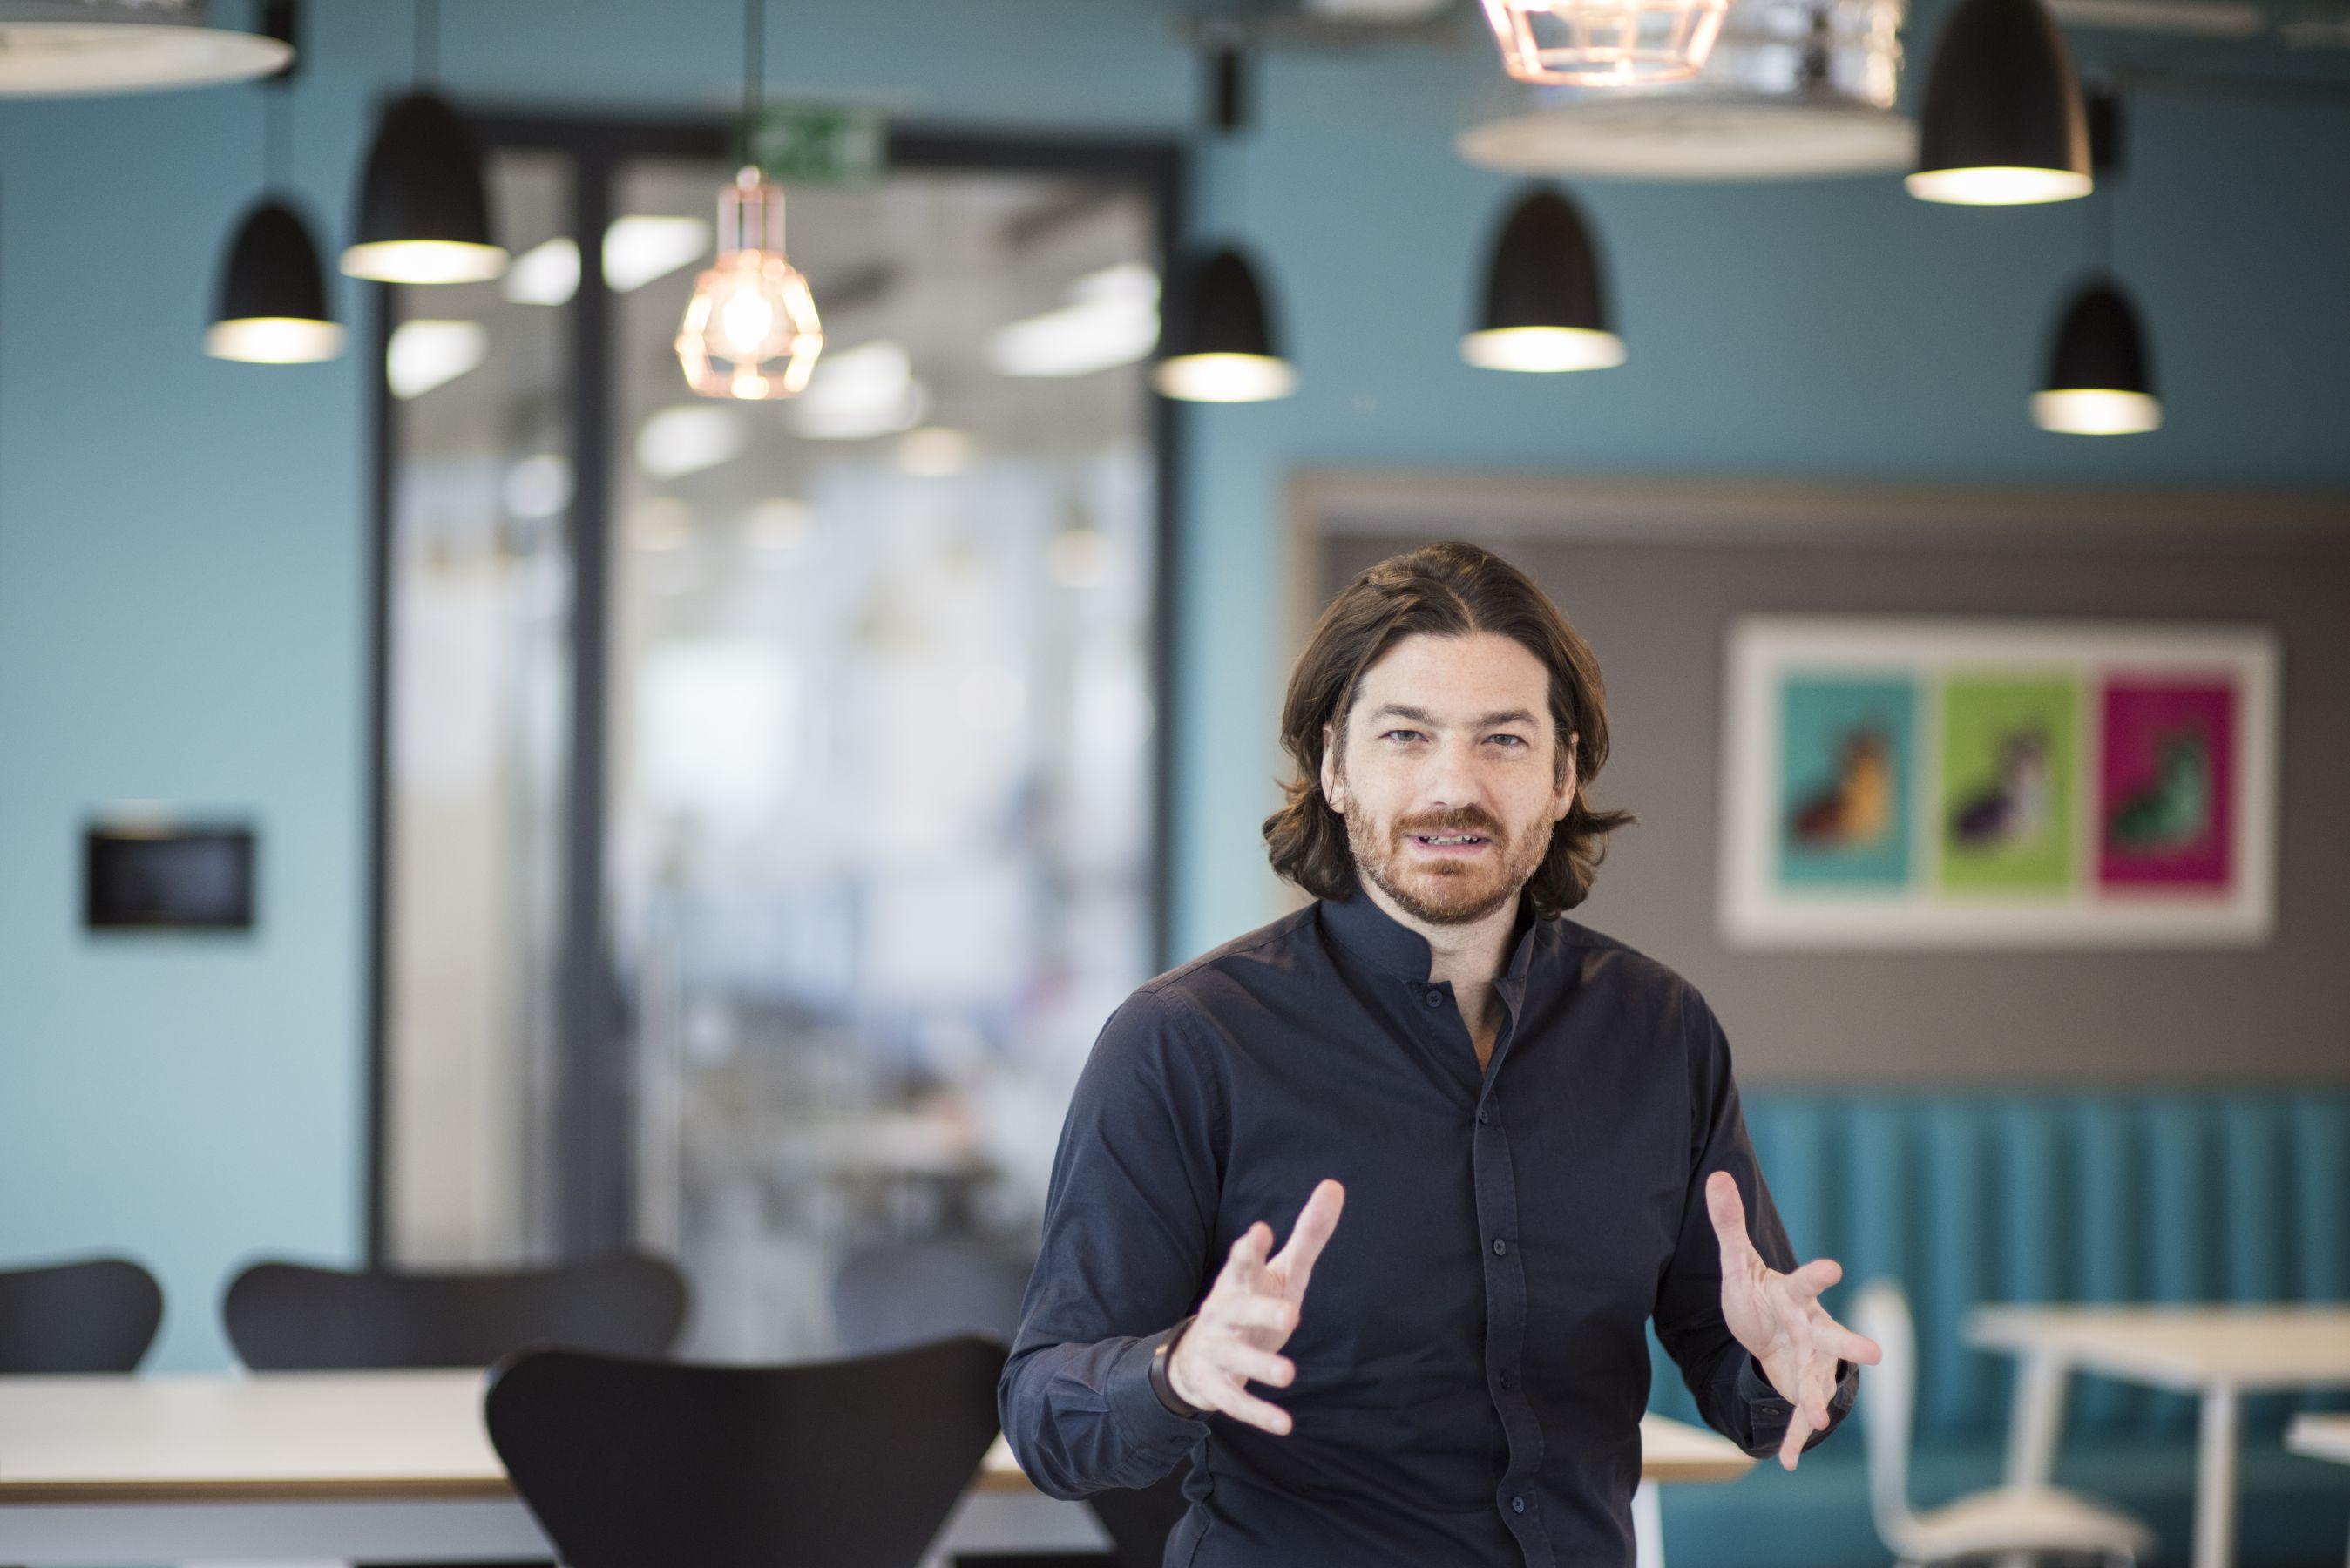 TechCrunch Disrupt: Start-ups: How Do You Build a Team of Top Talent?